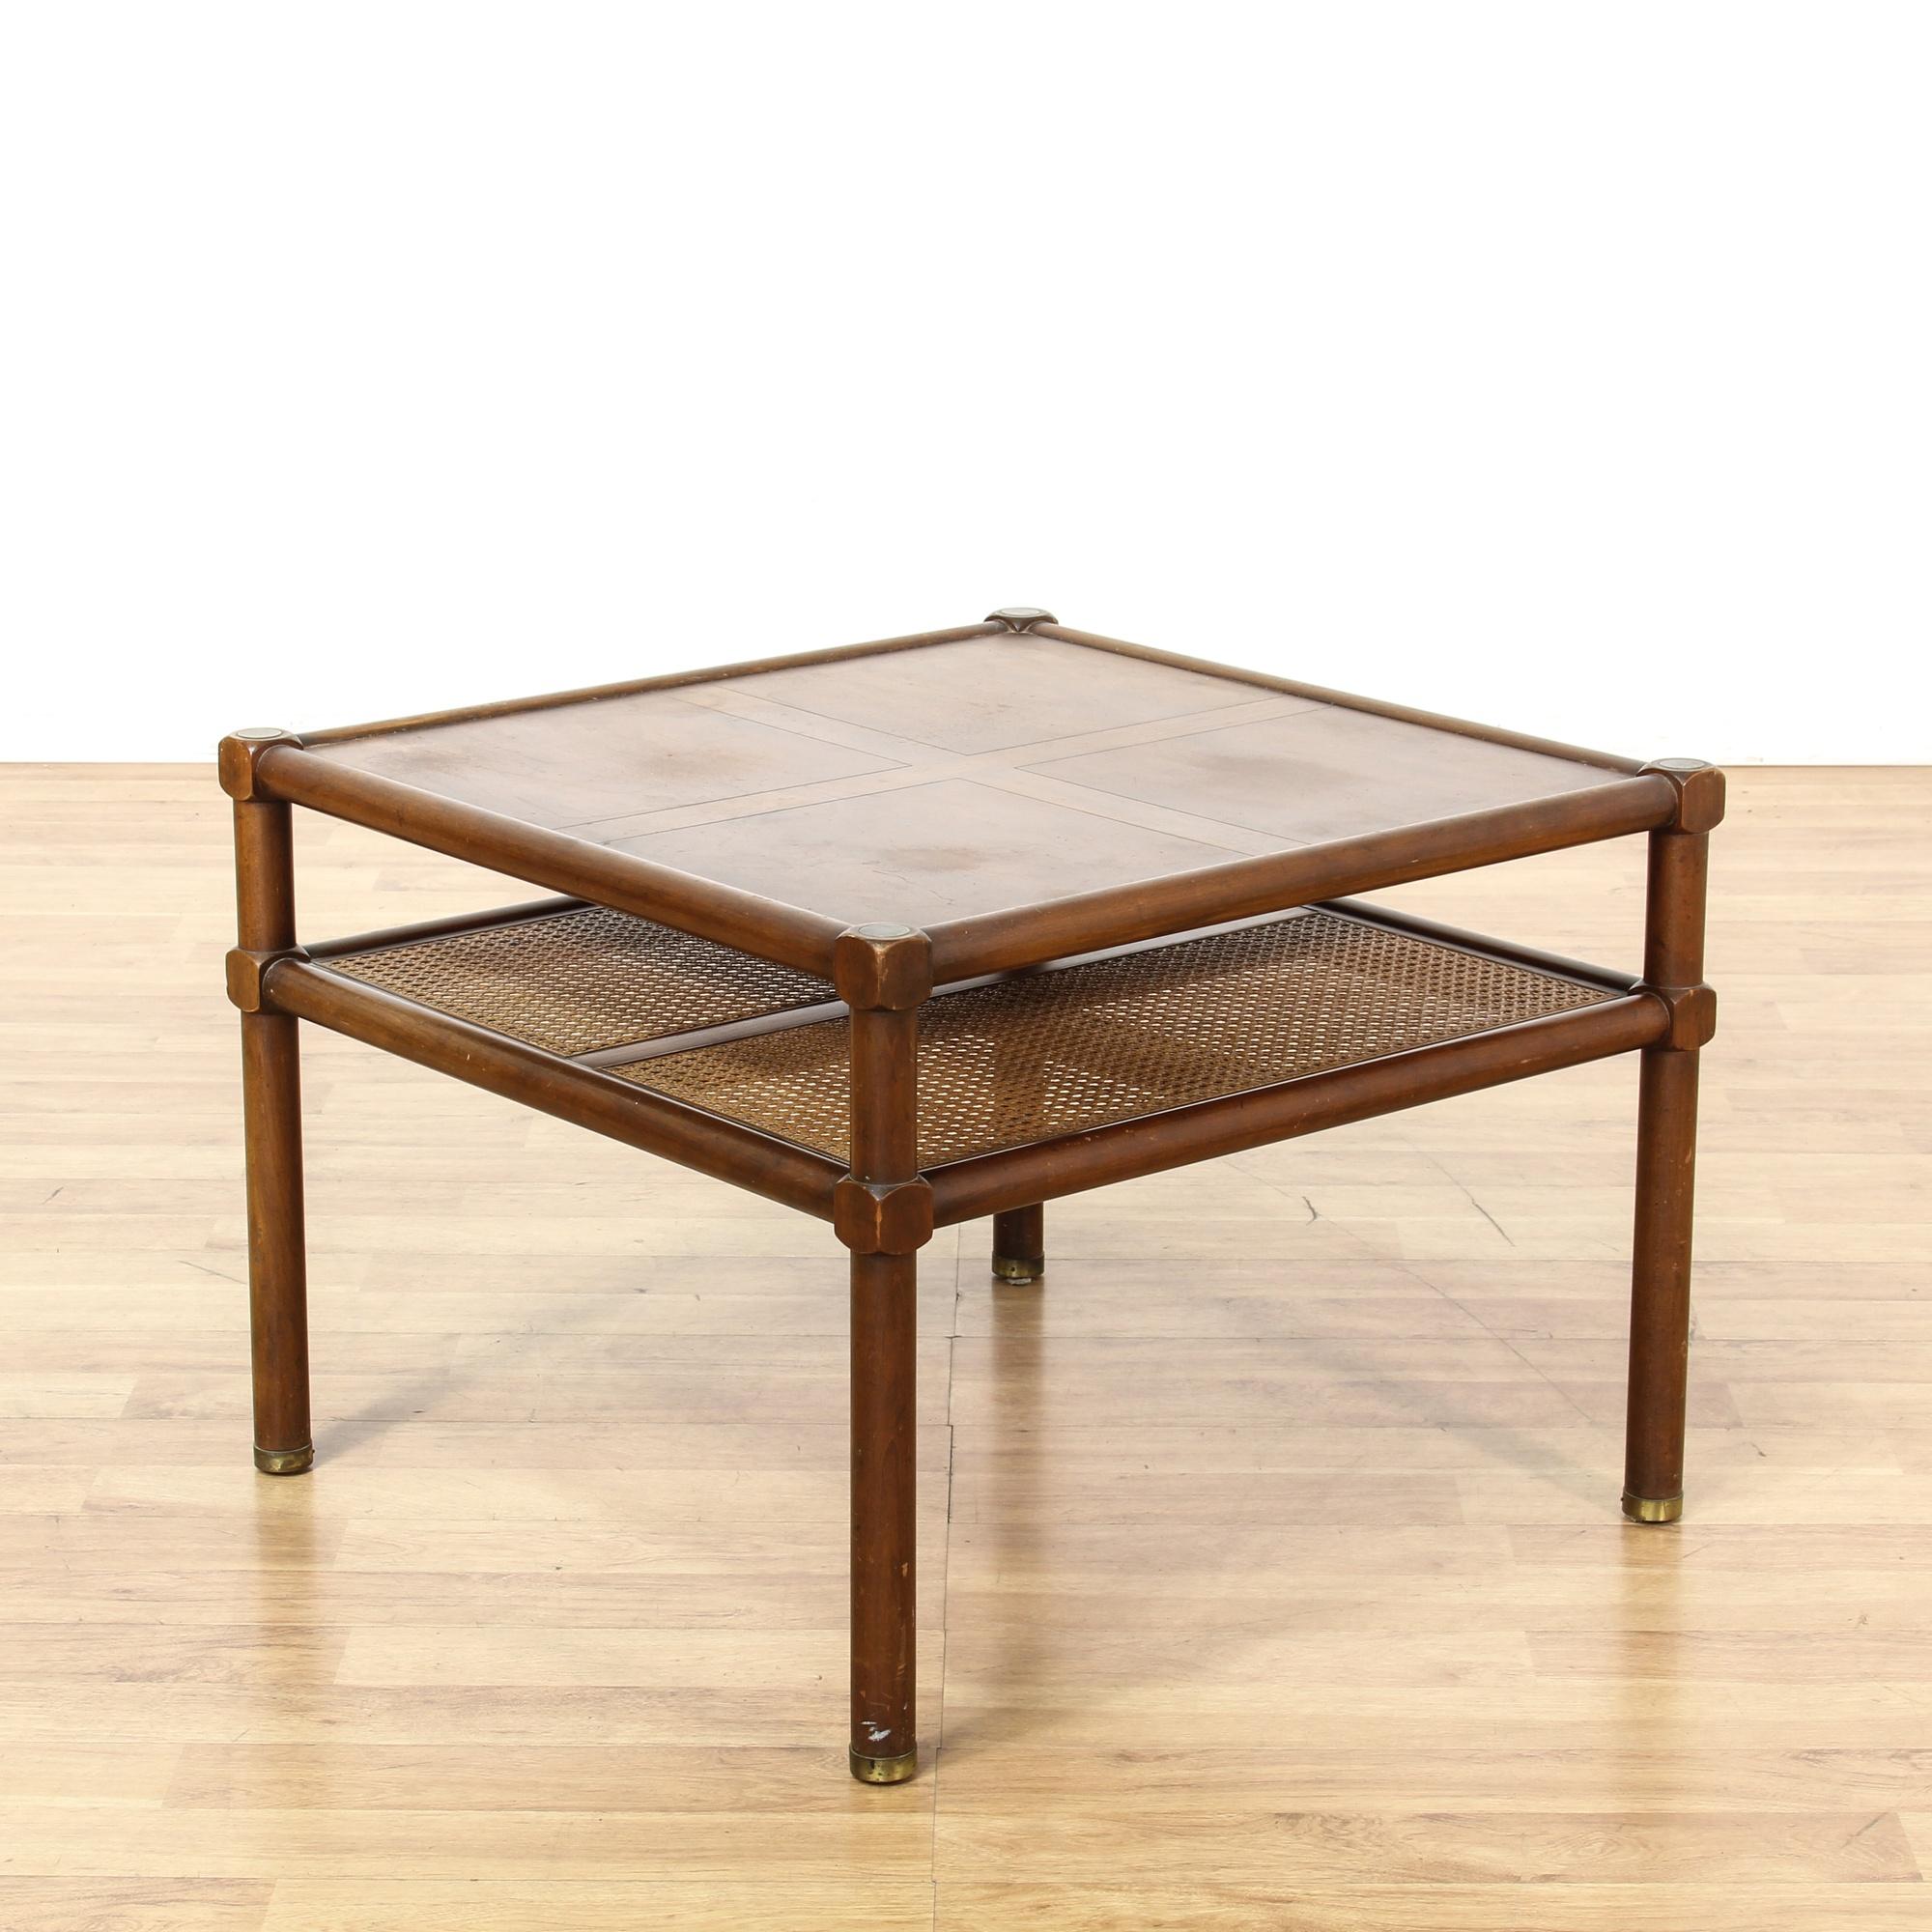 Wooden 2 Tier Wicker Bottom Coffee Table Loveseat Vintage Furniture San Diego Los Angeles